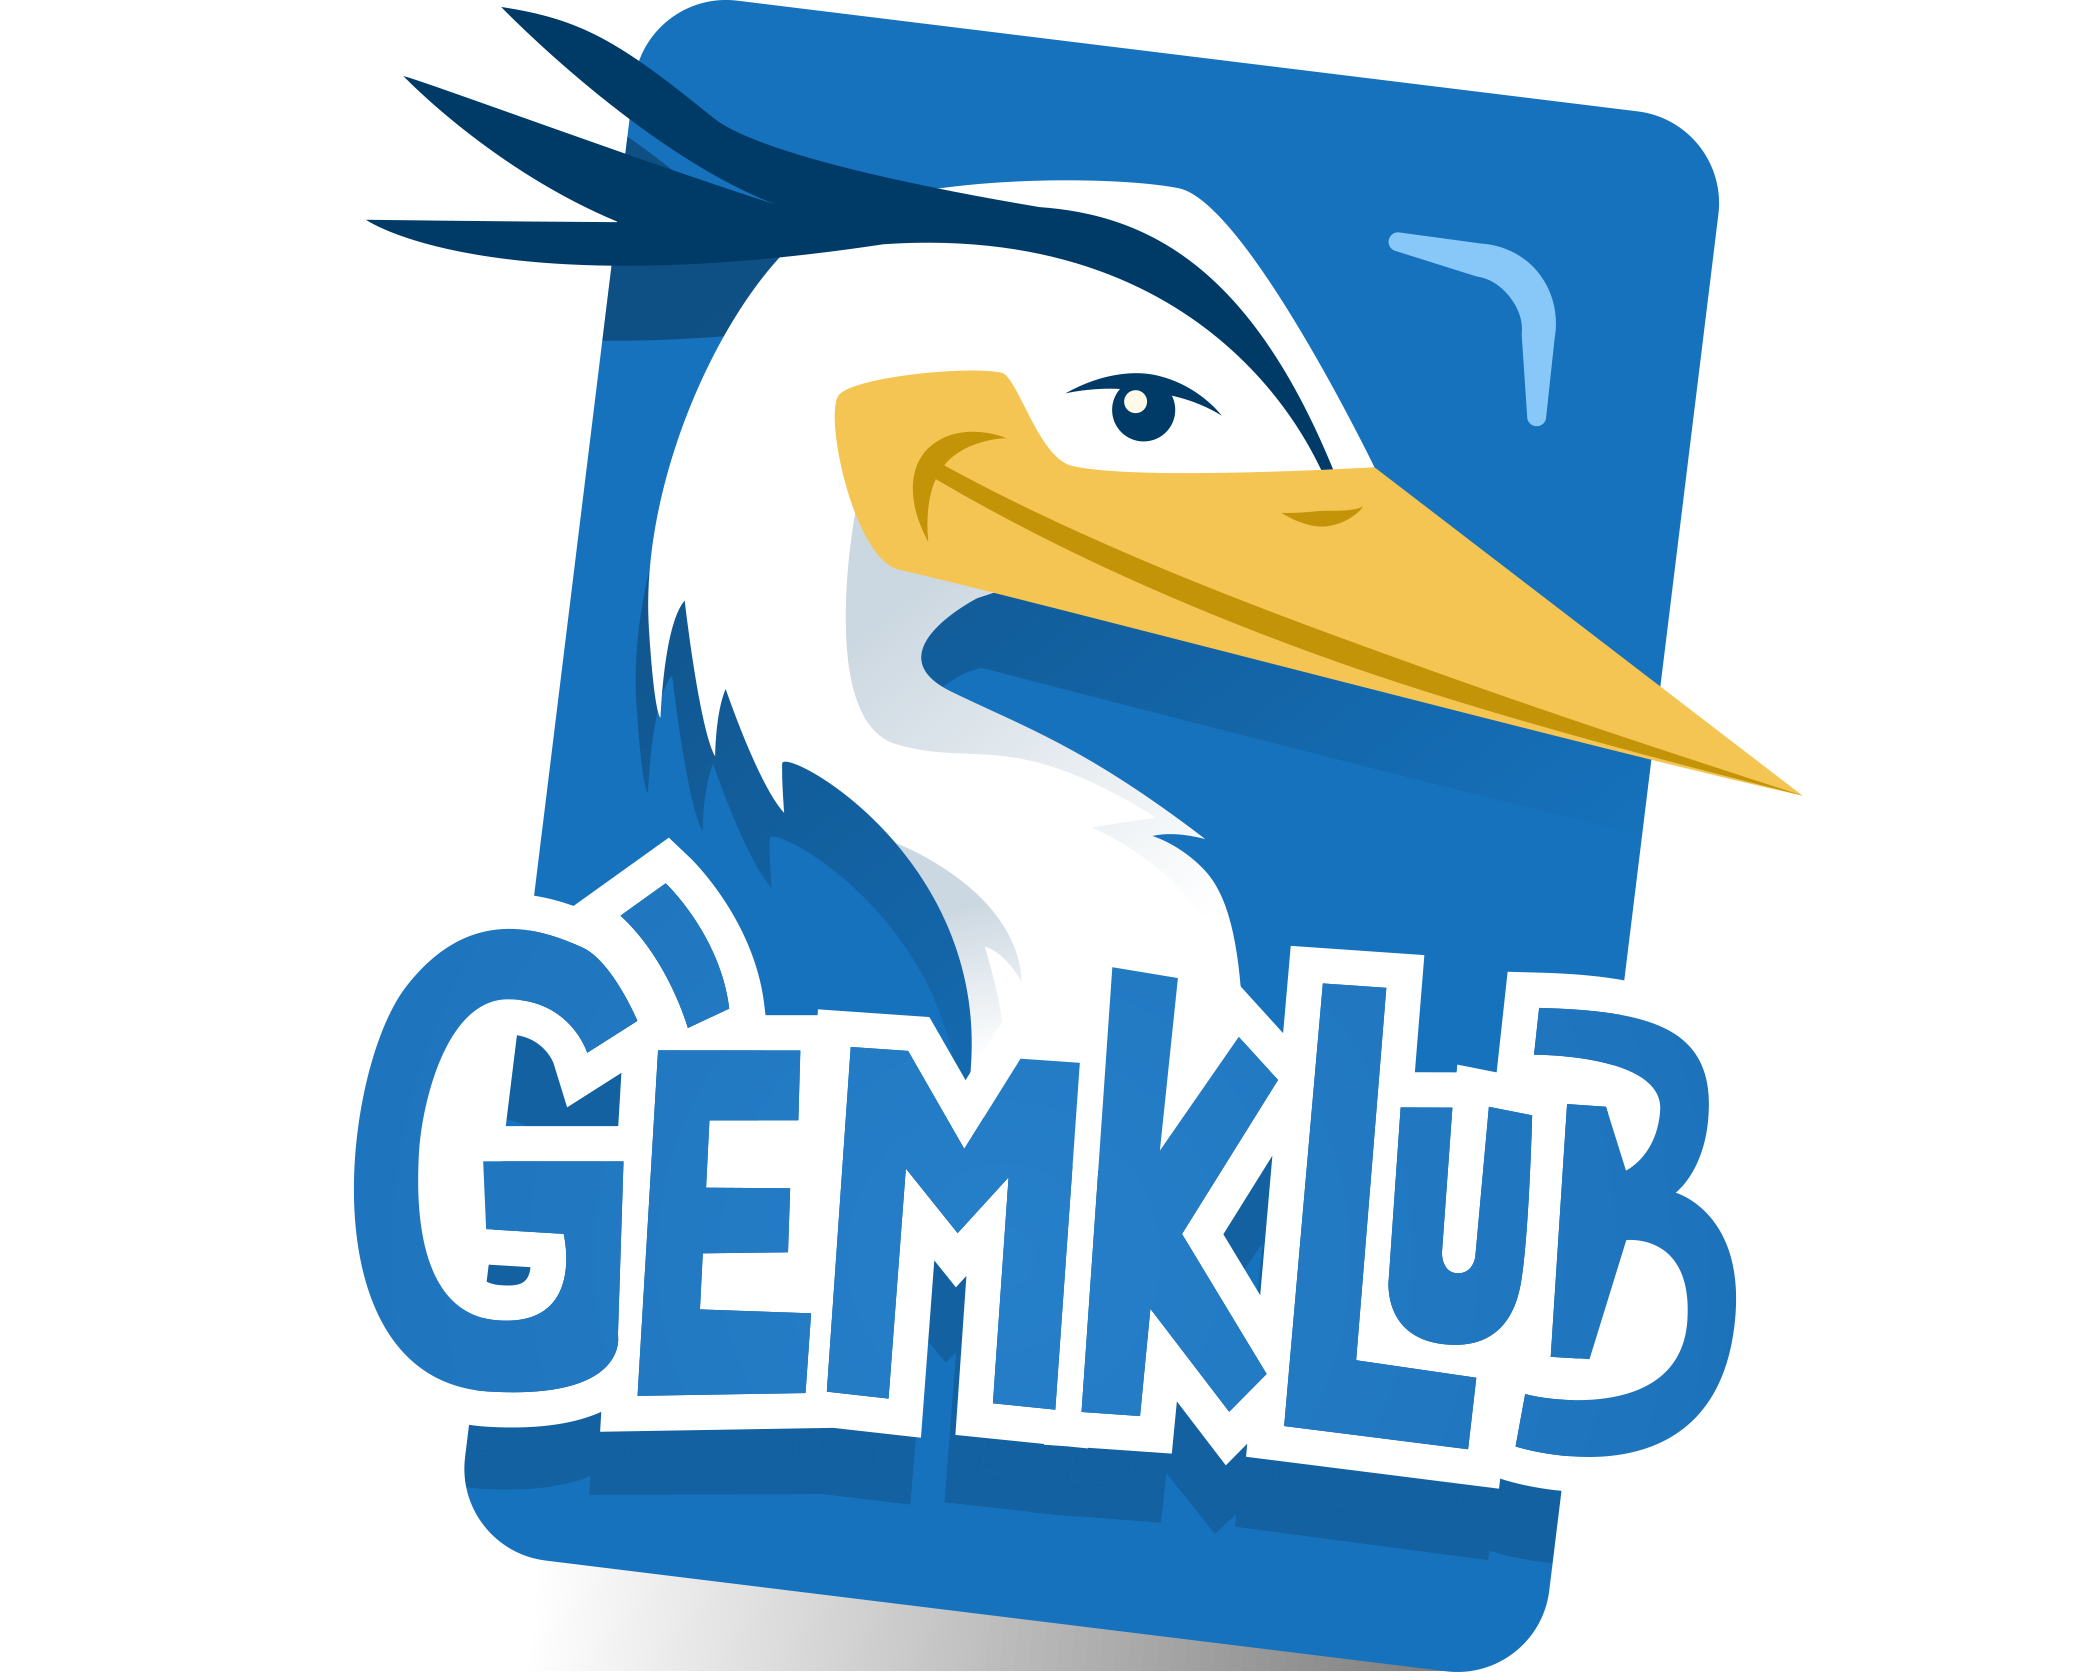 gèmklub logo